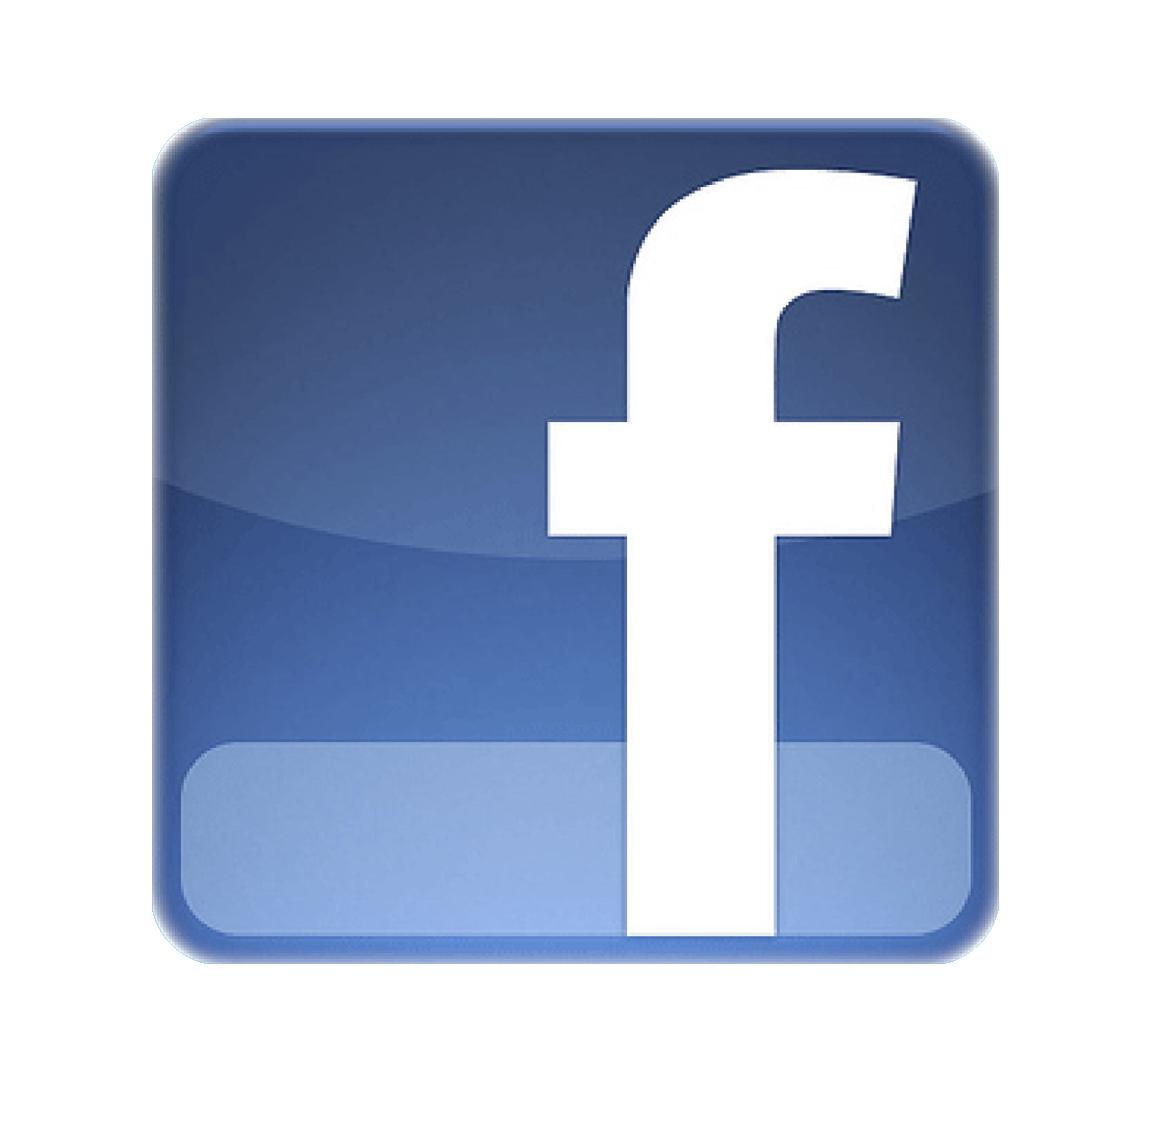 30 Minute Lemon Tart Hd logo, Facebook